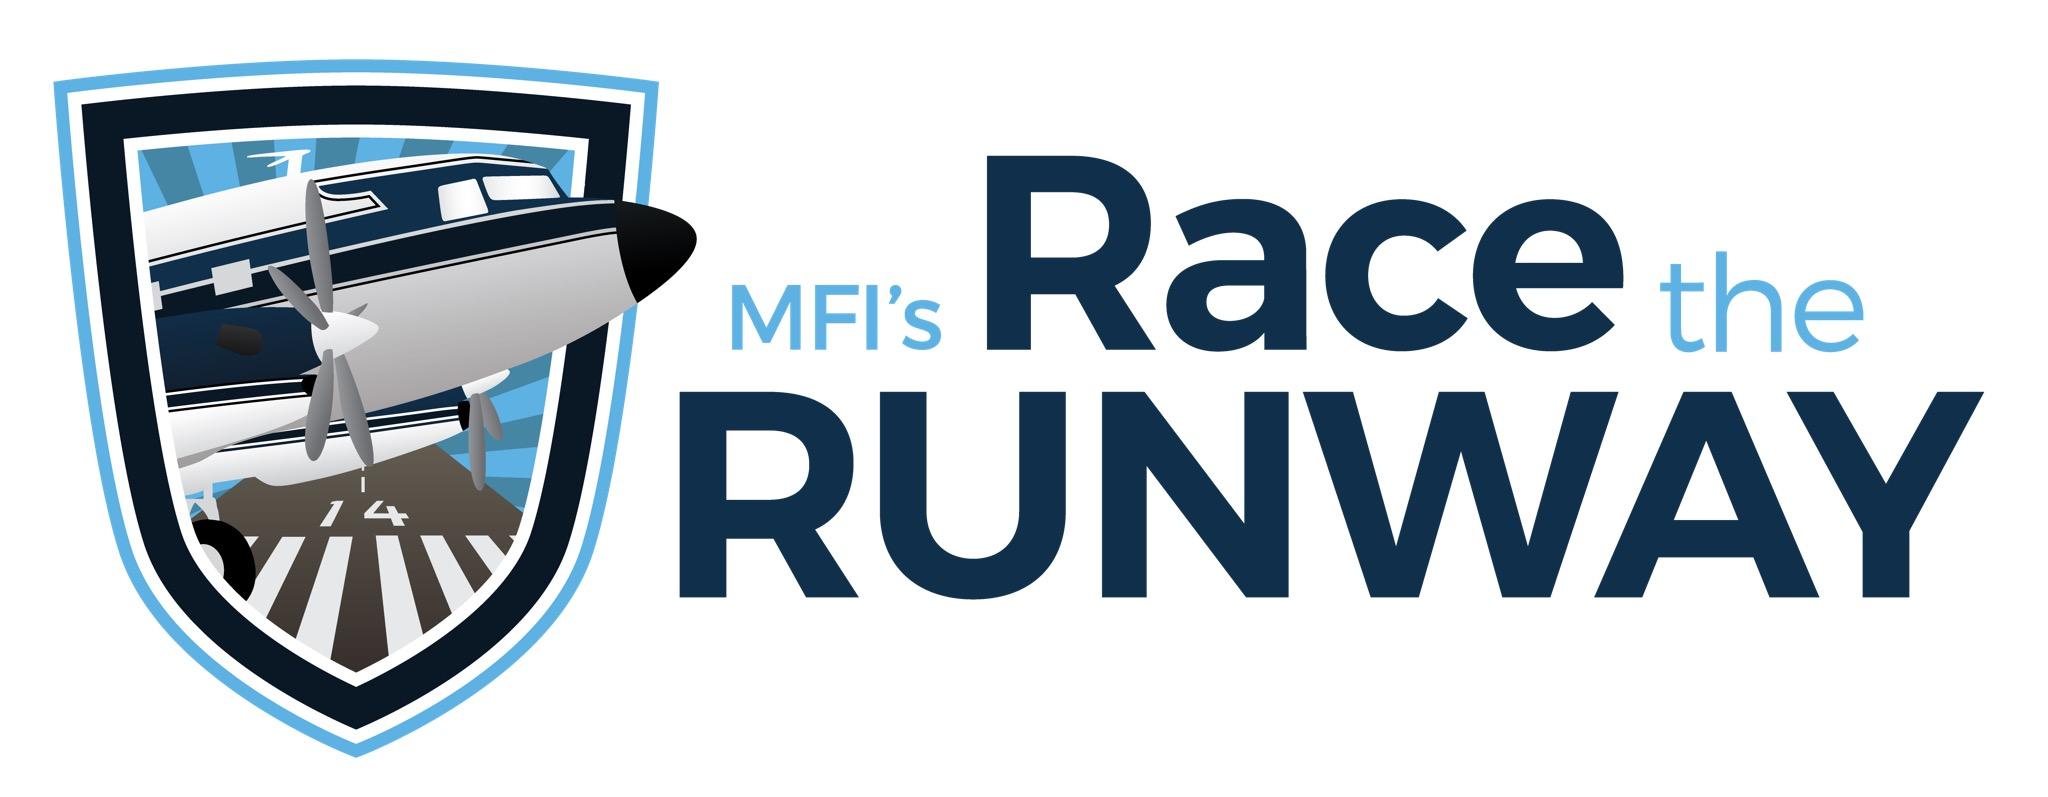 MFI's Race the Runway.jpg